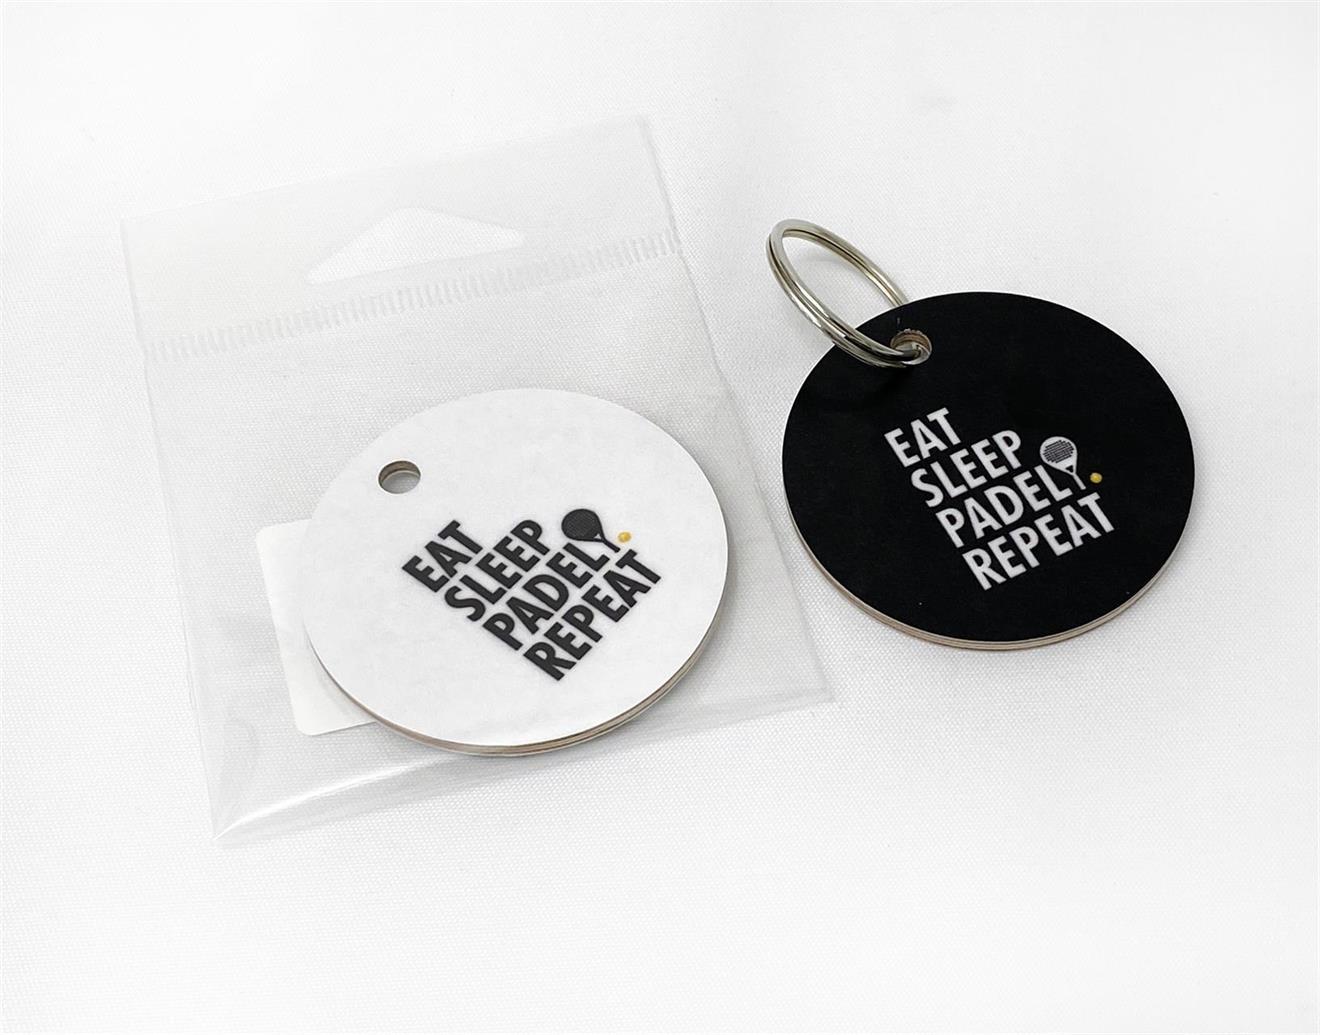 Nyckelring, Padel repeat, svart/vit text